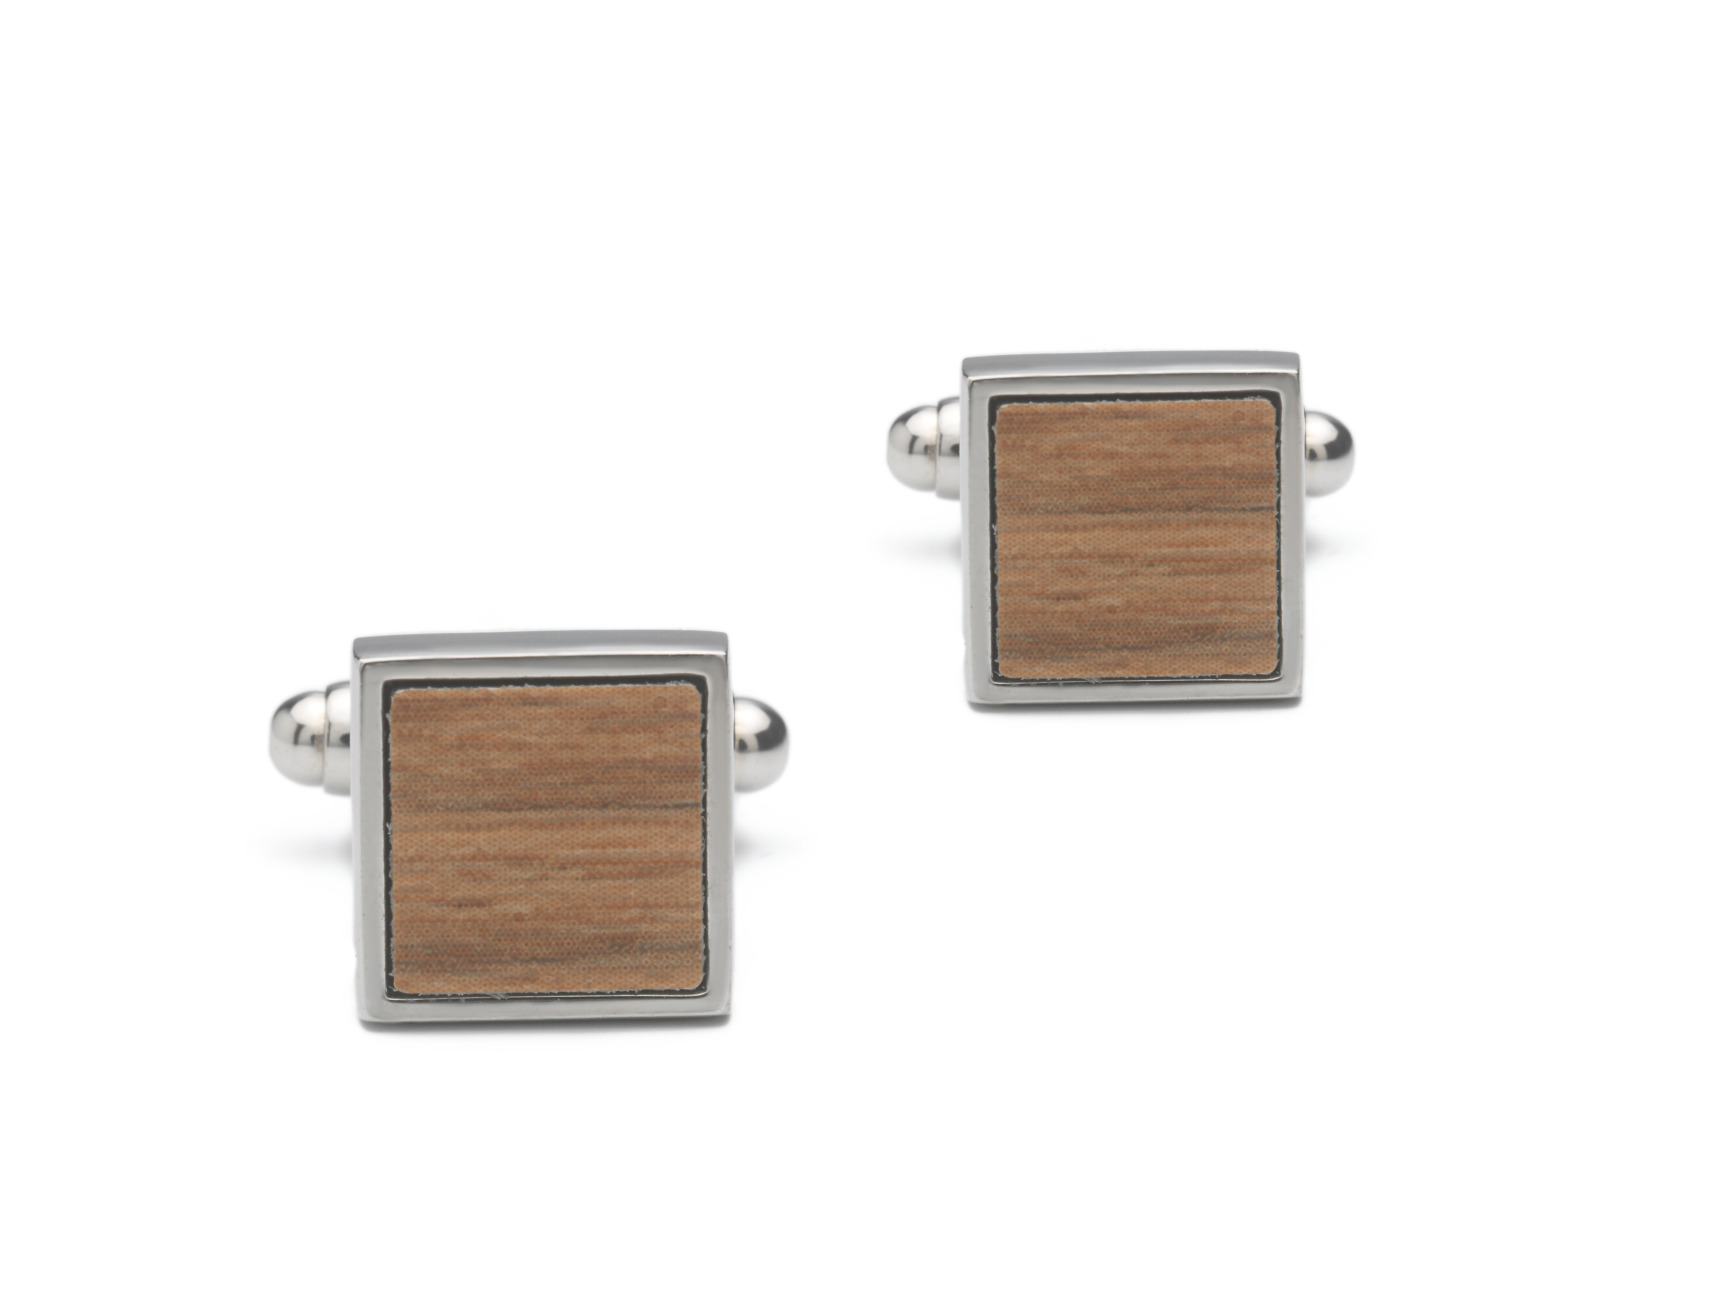 Bräutigam  Mode Accessoire Manschettenknopf aus Holz C5-SQ-B